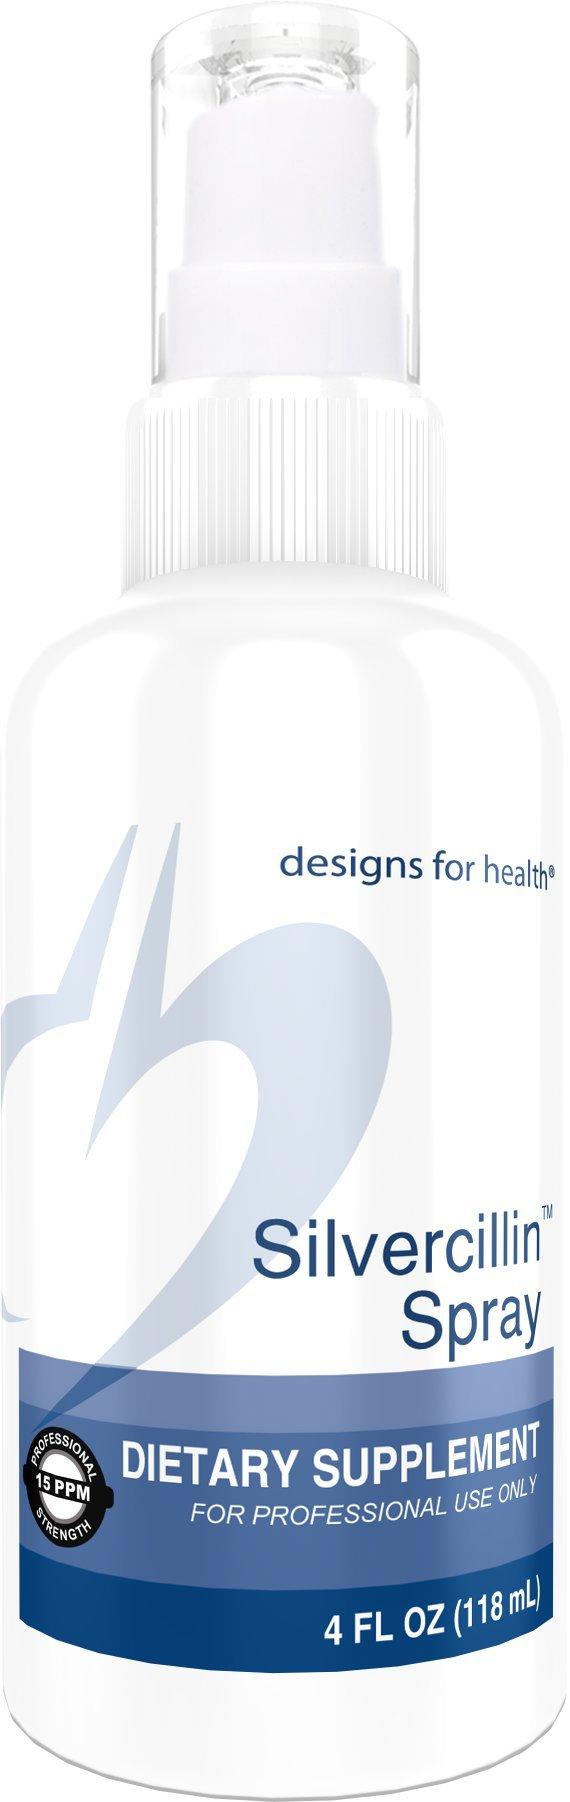 Designs for Health - Silvercillin Spray - 15ppm Silver for Immune Support, 4oz.